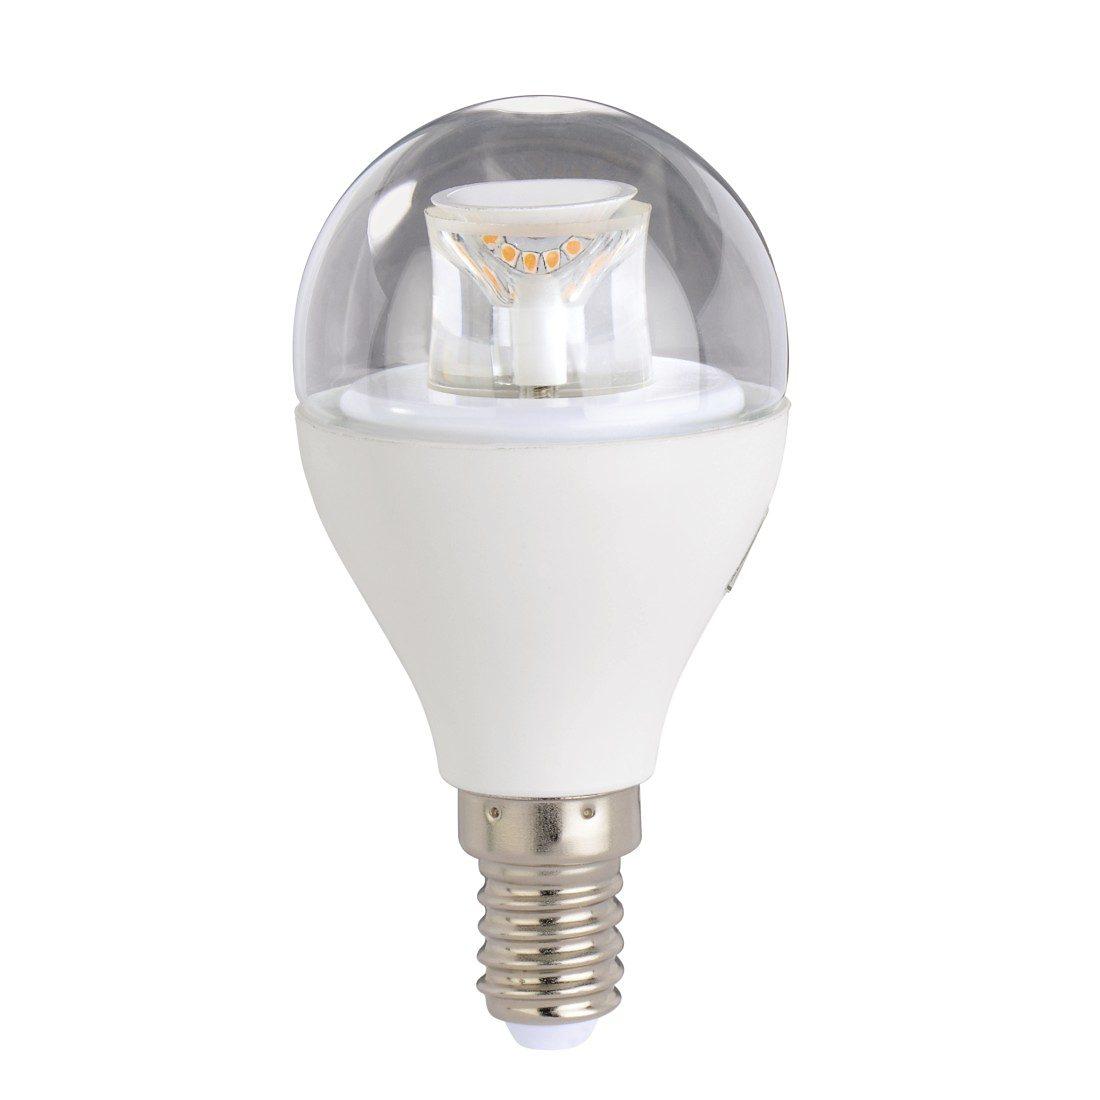 Xavax LED-Lampe, E14, 470lm ersetzt 40W Tropfenlampe, Warmweiß